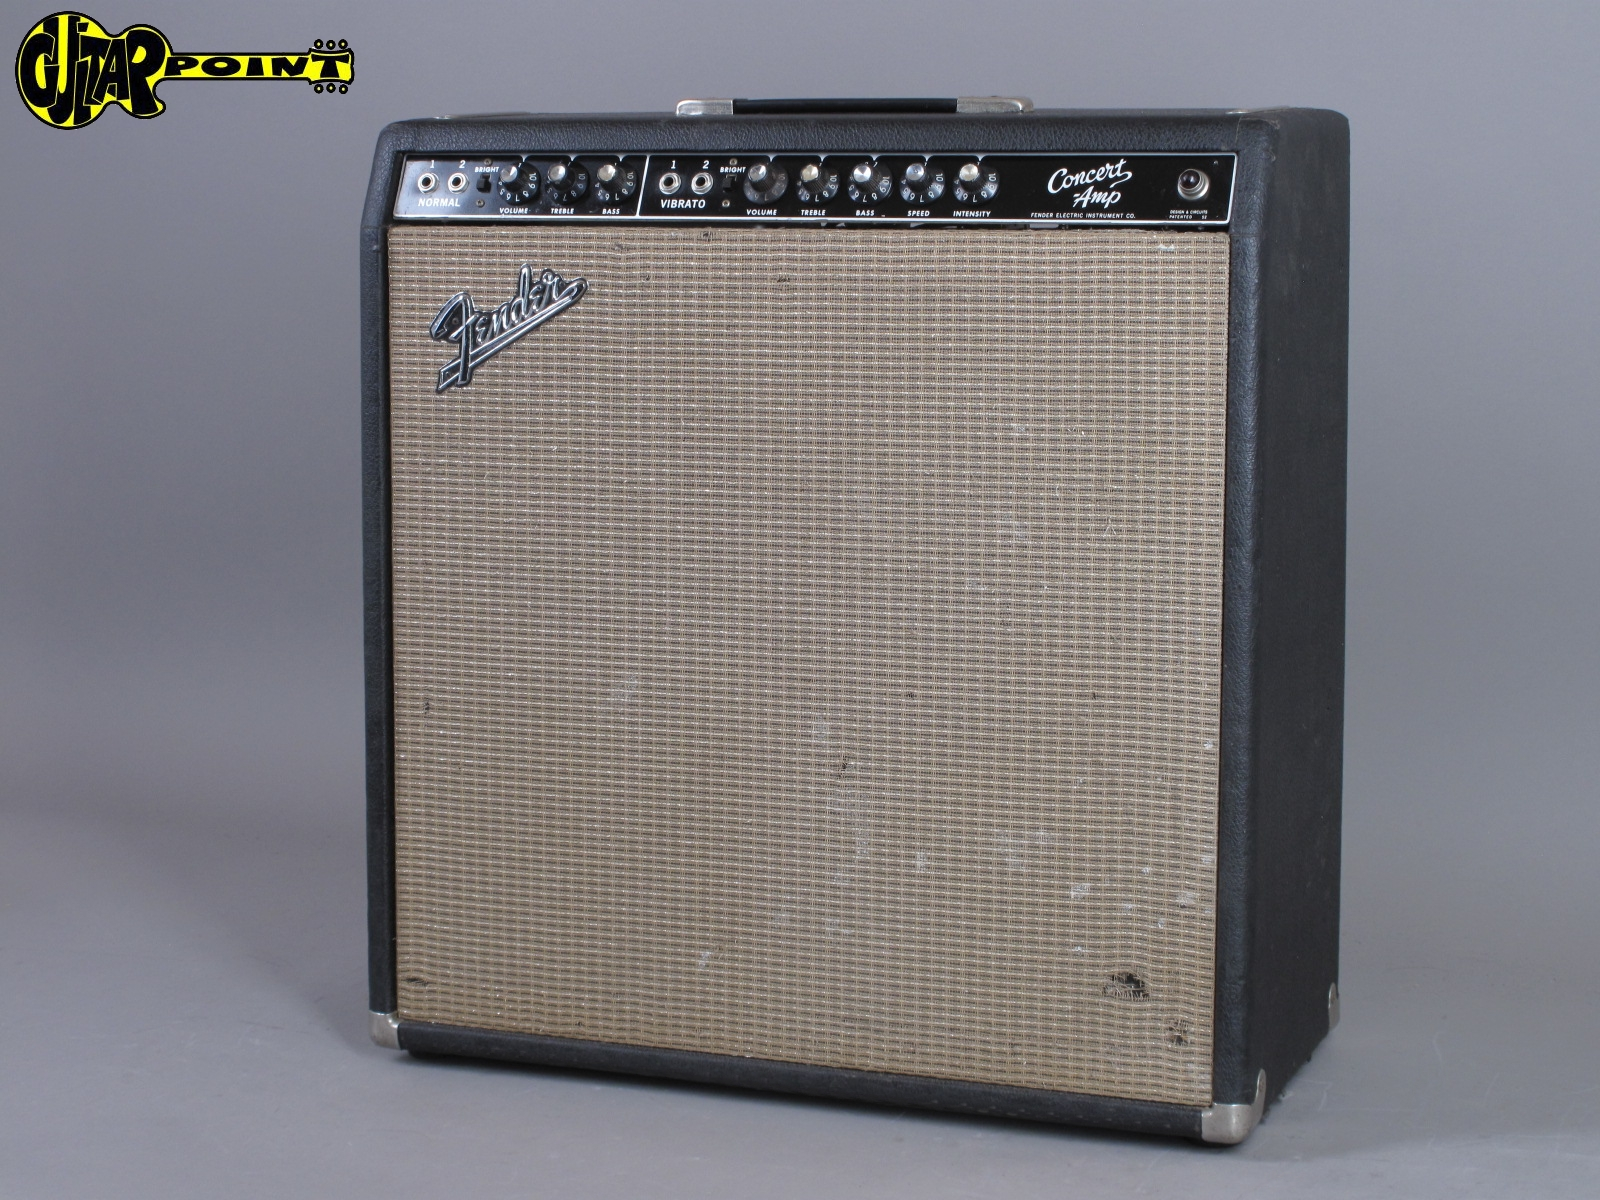 https://guitarpoint.de/app/uploads/products/1963-fender-concert-4x10-tube-amp-blackface/Fender63ConcertA00285x_2.jpg